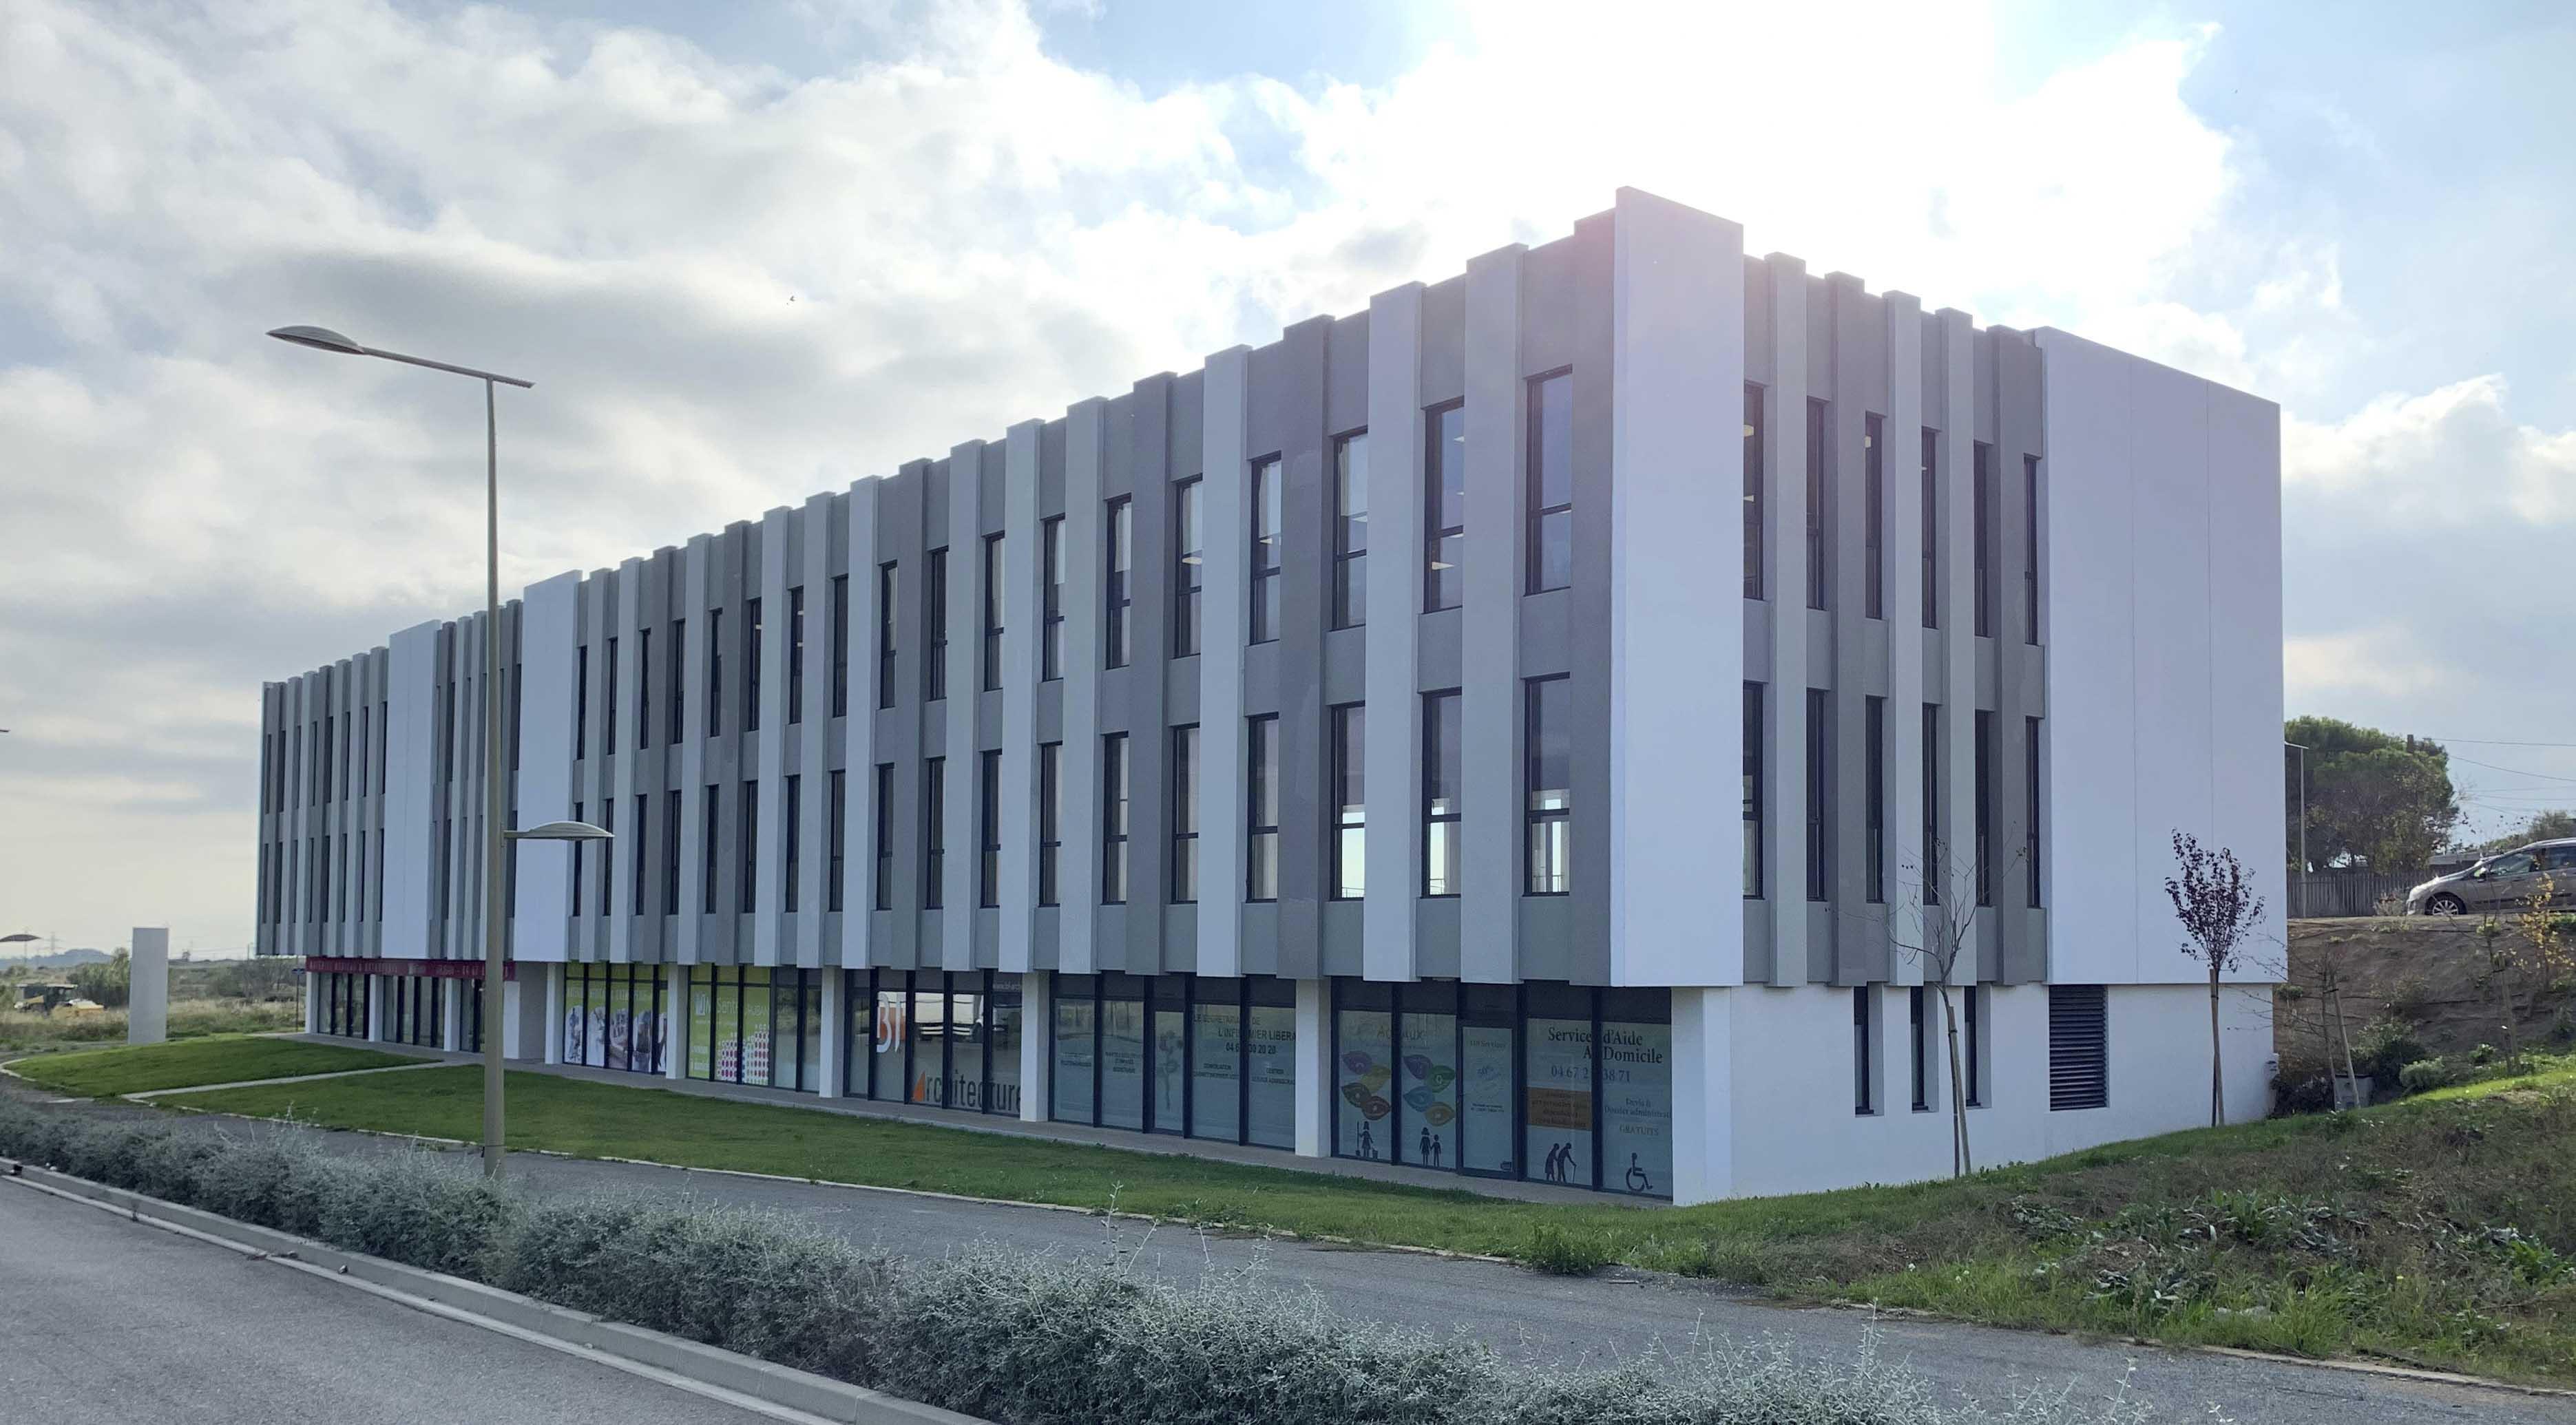 Immeuble le Ruban Béziers BF Architecture 8